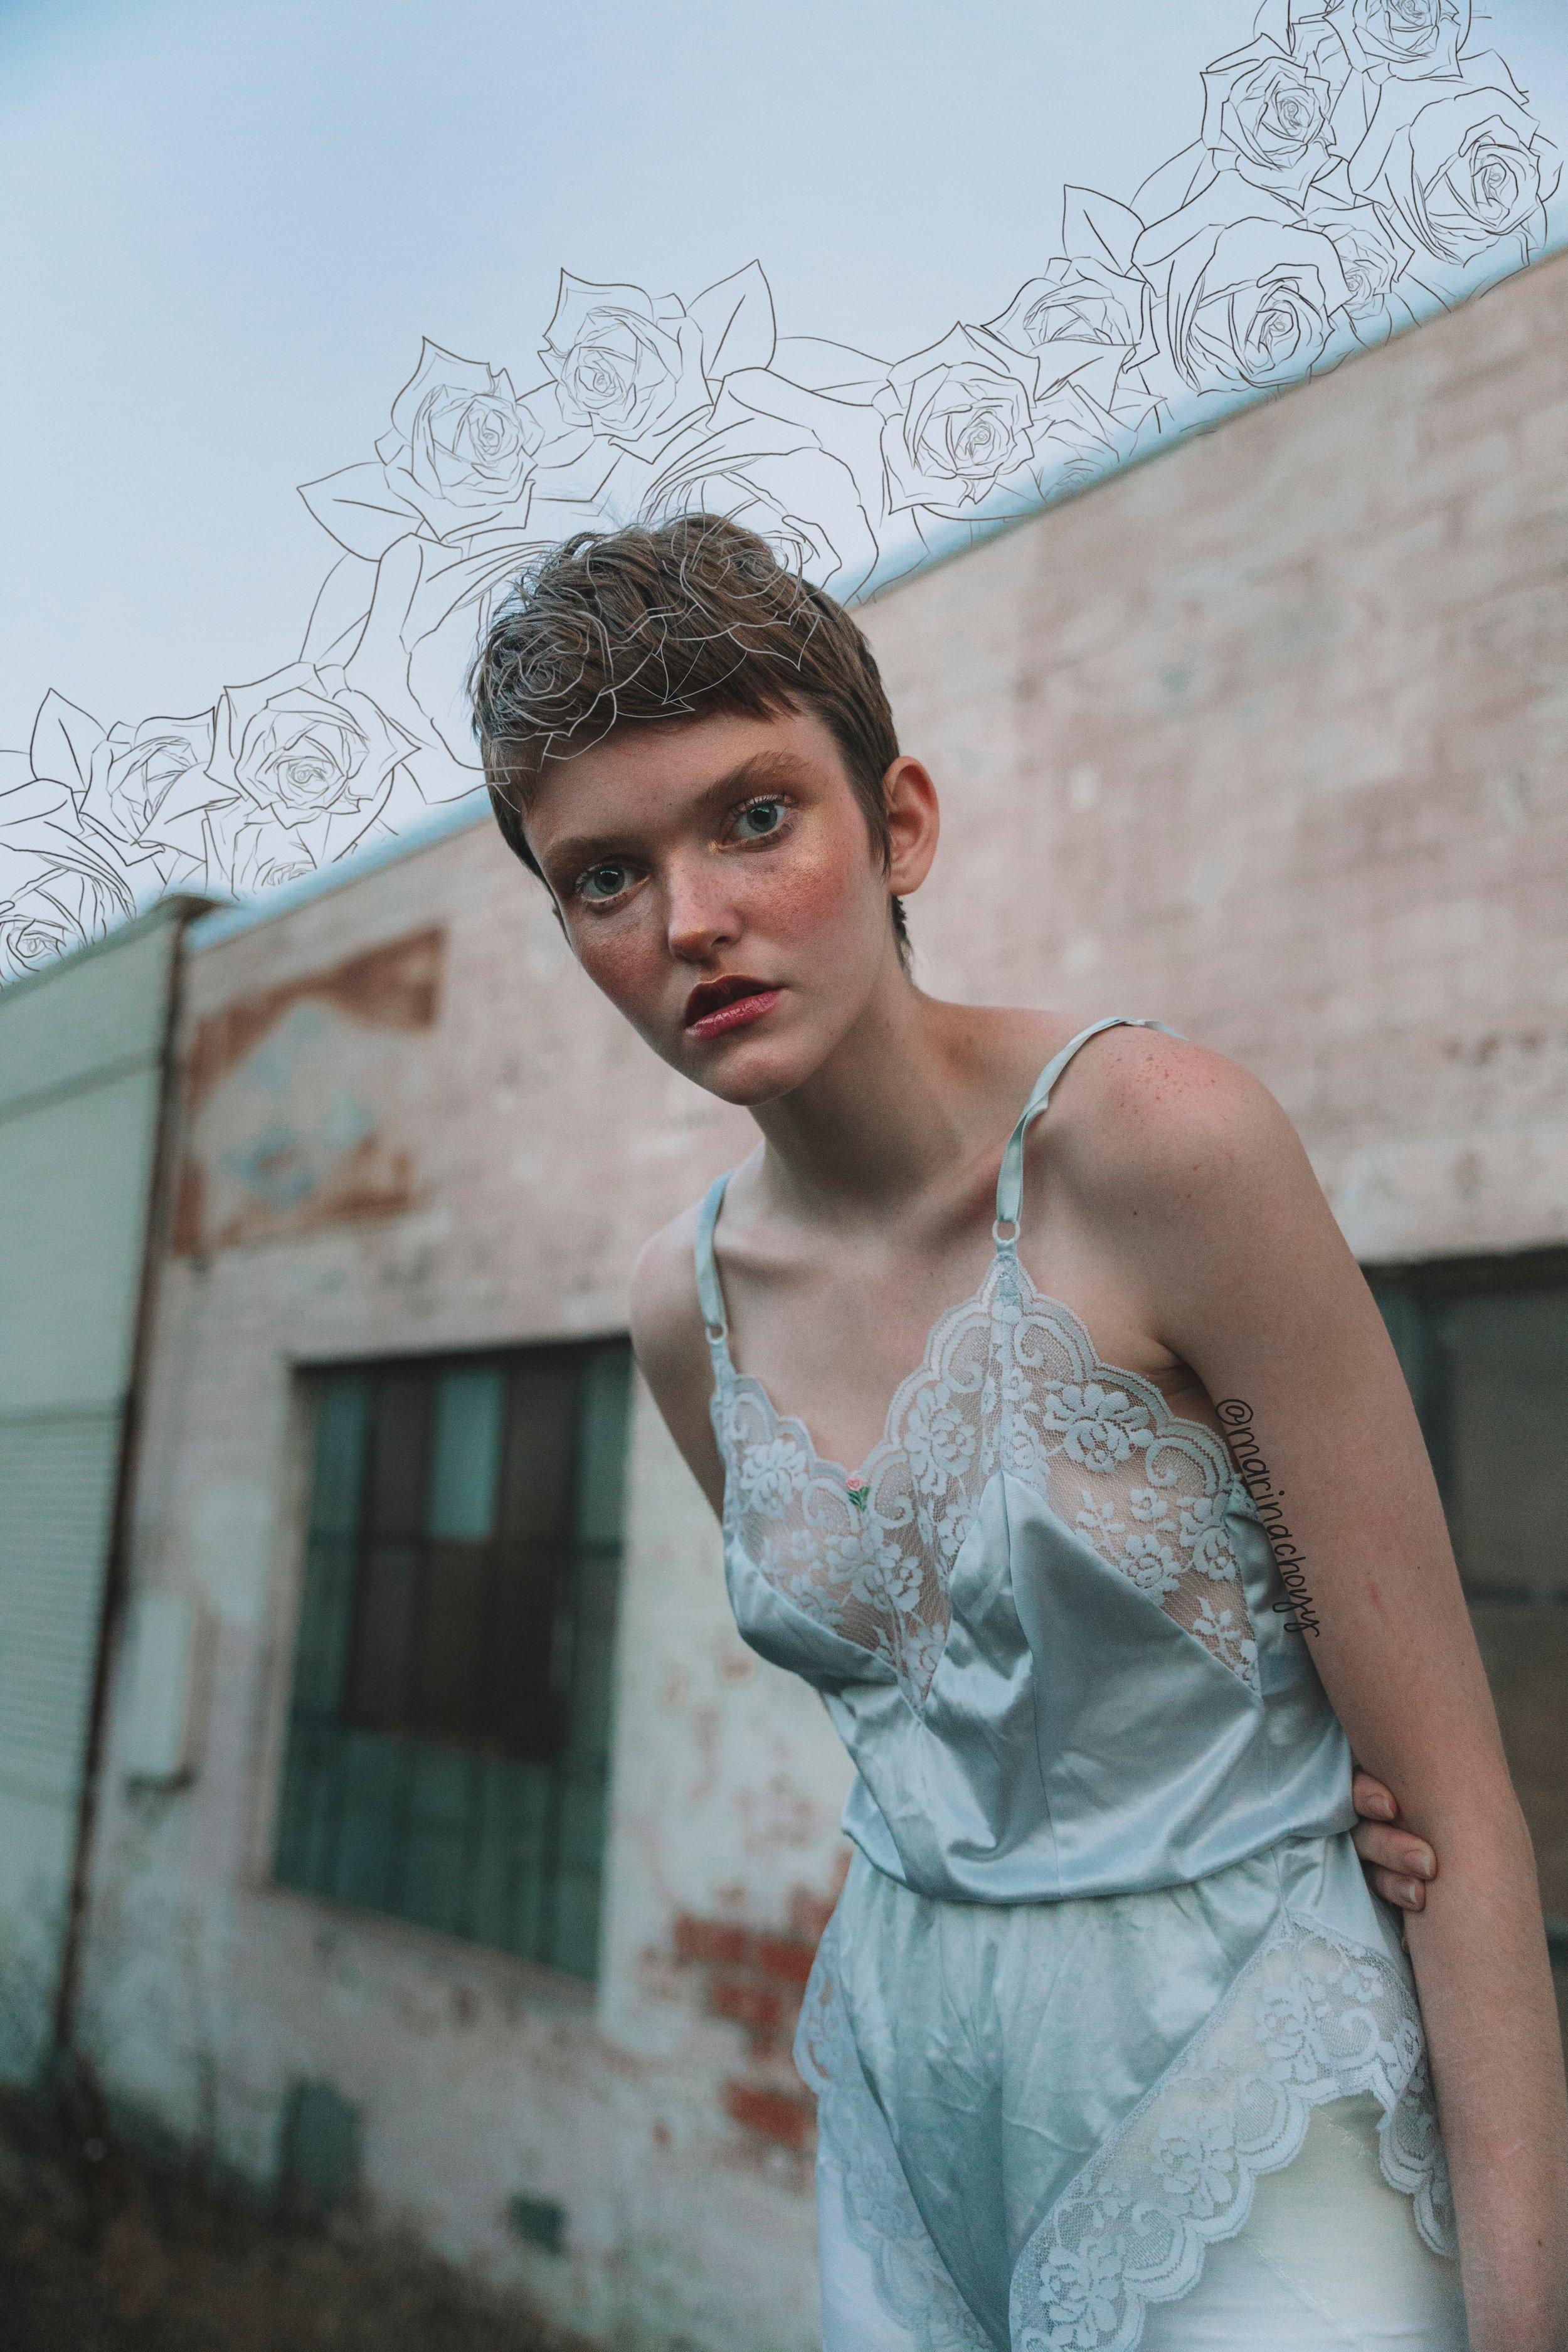 Ally x LA - Model: Ally (@possibally)Styling/Assistance: Allegra (@messinaphotos)HMUA: Crystal (@ewwjalanis)Photography/Illustrations: Marina (@marinachoyy)